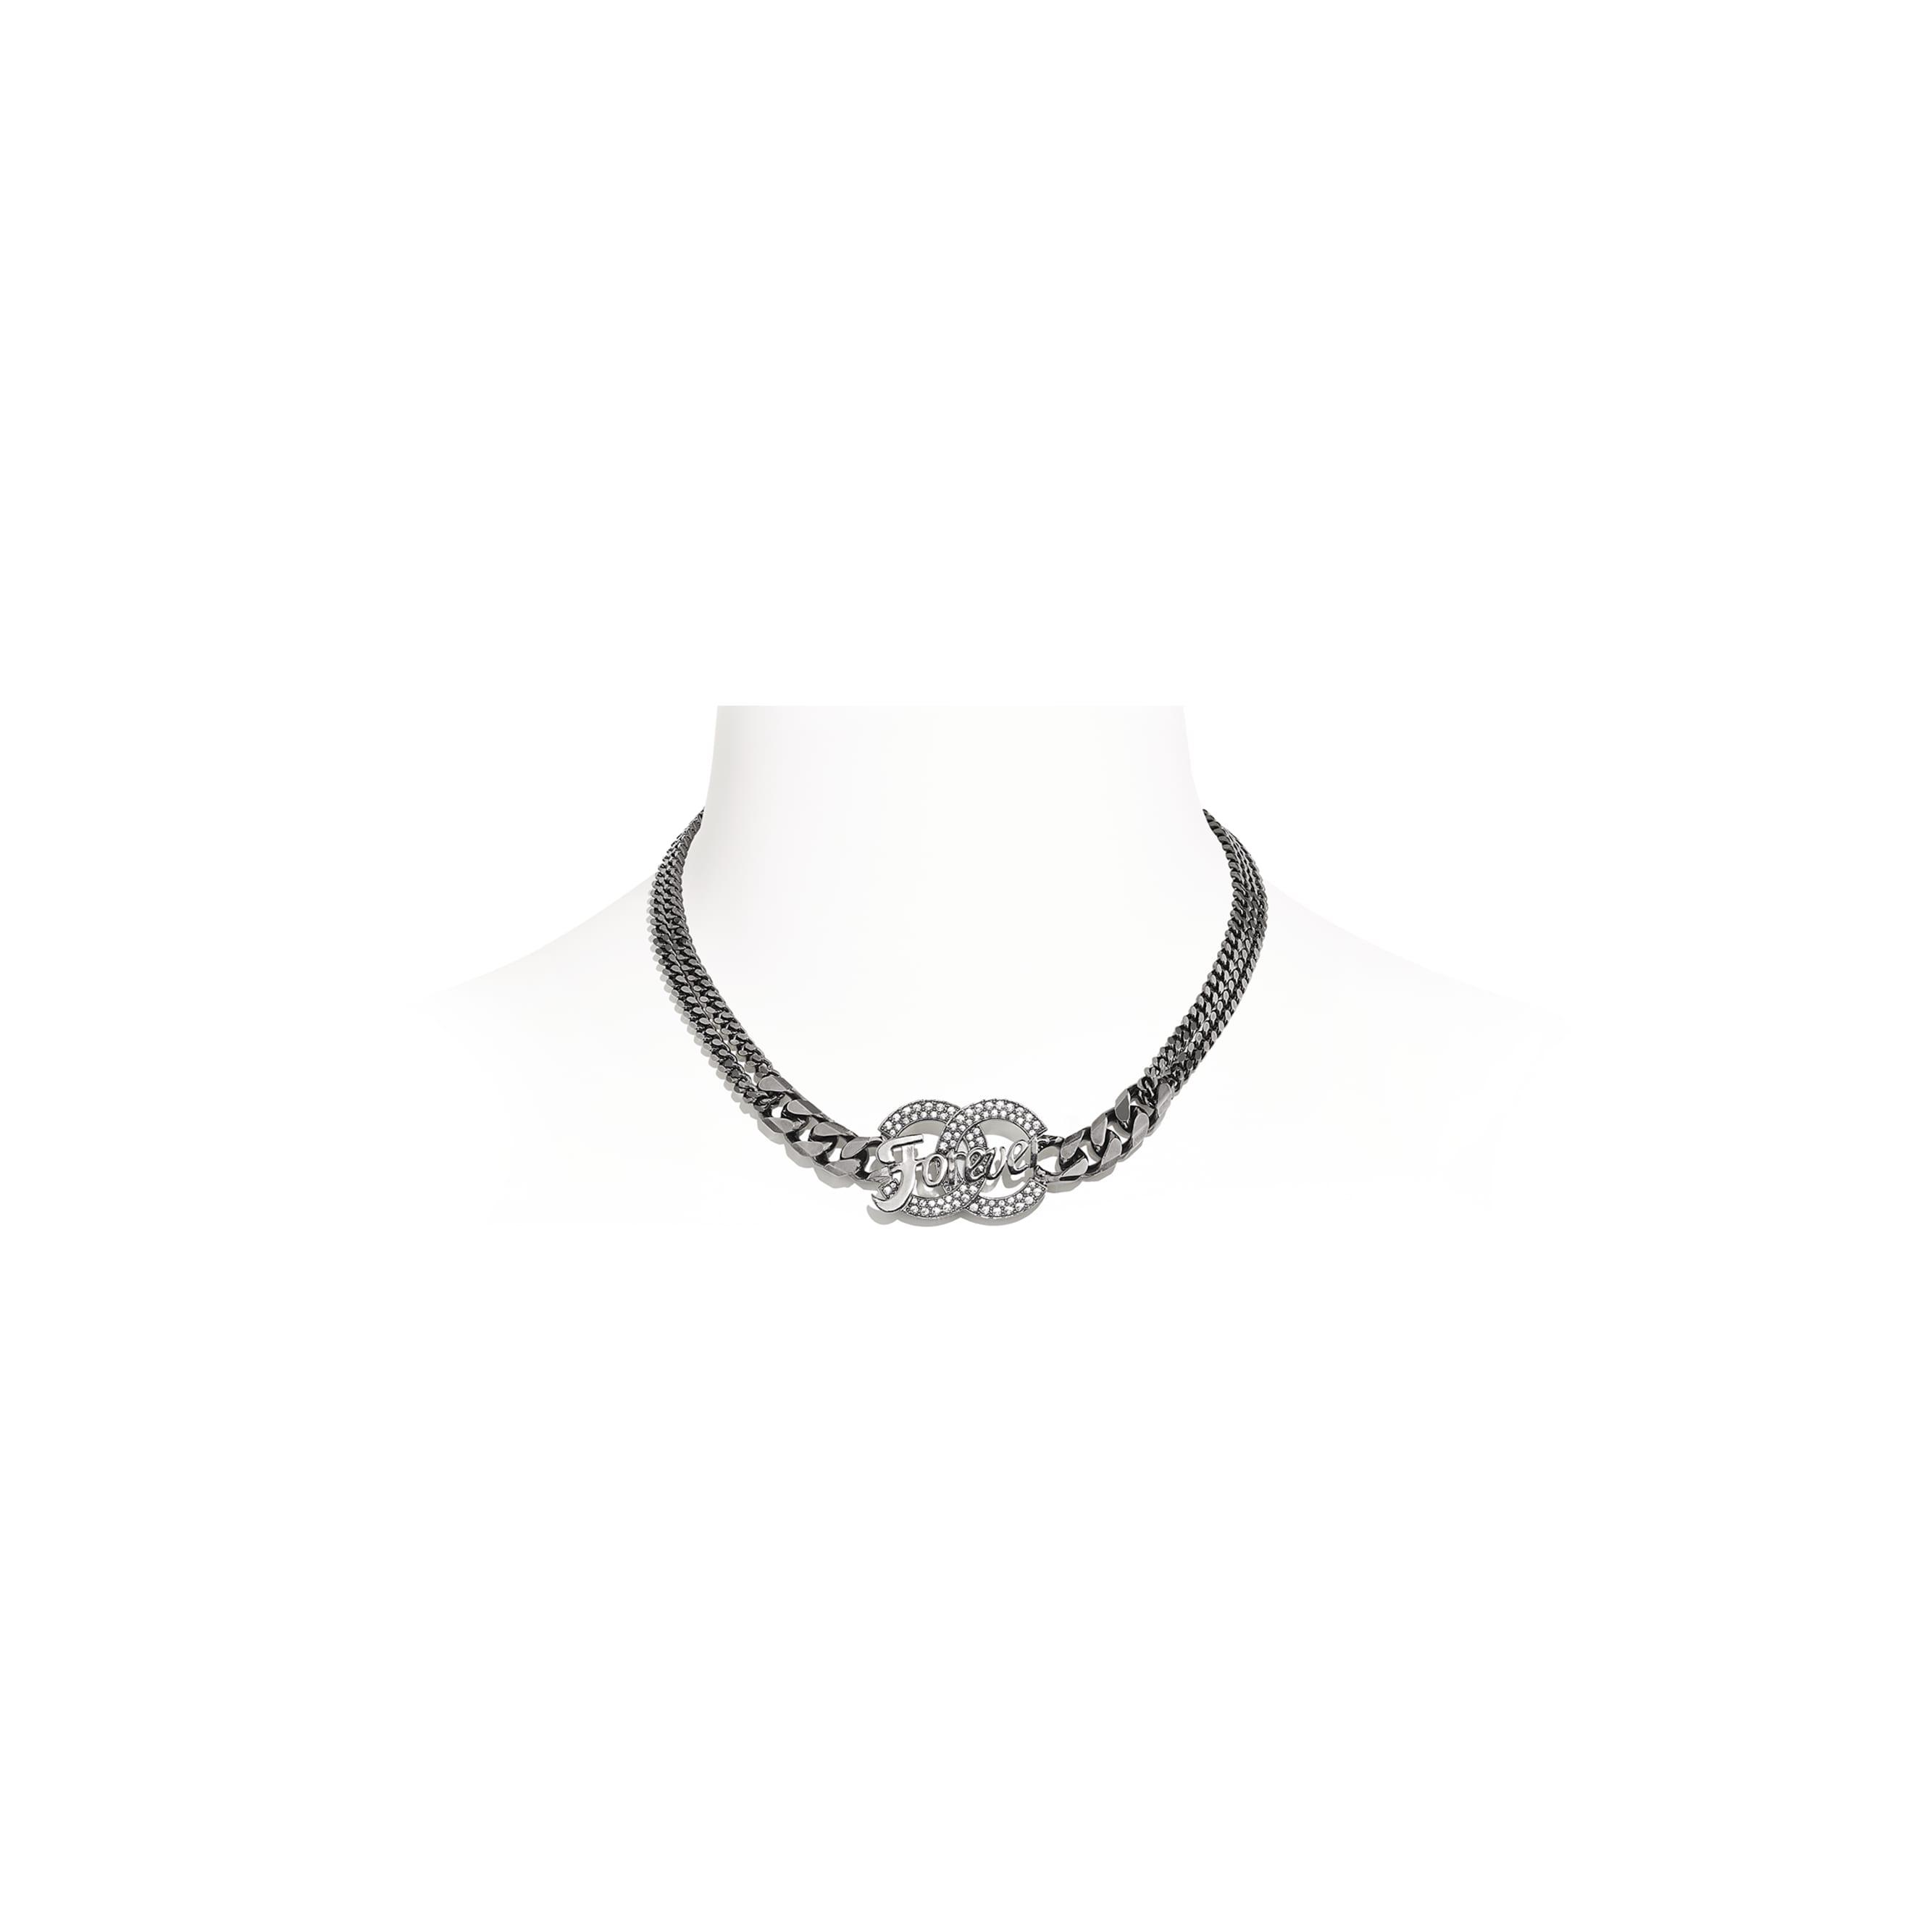 Necklace - Ruthenium & Crystal - Metal & Diamantés - CHANEL - Default view - see standard sized version